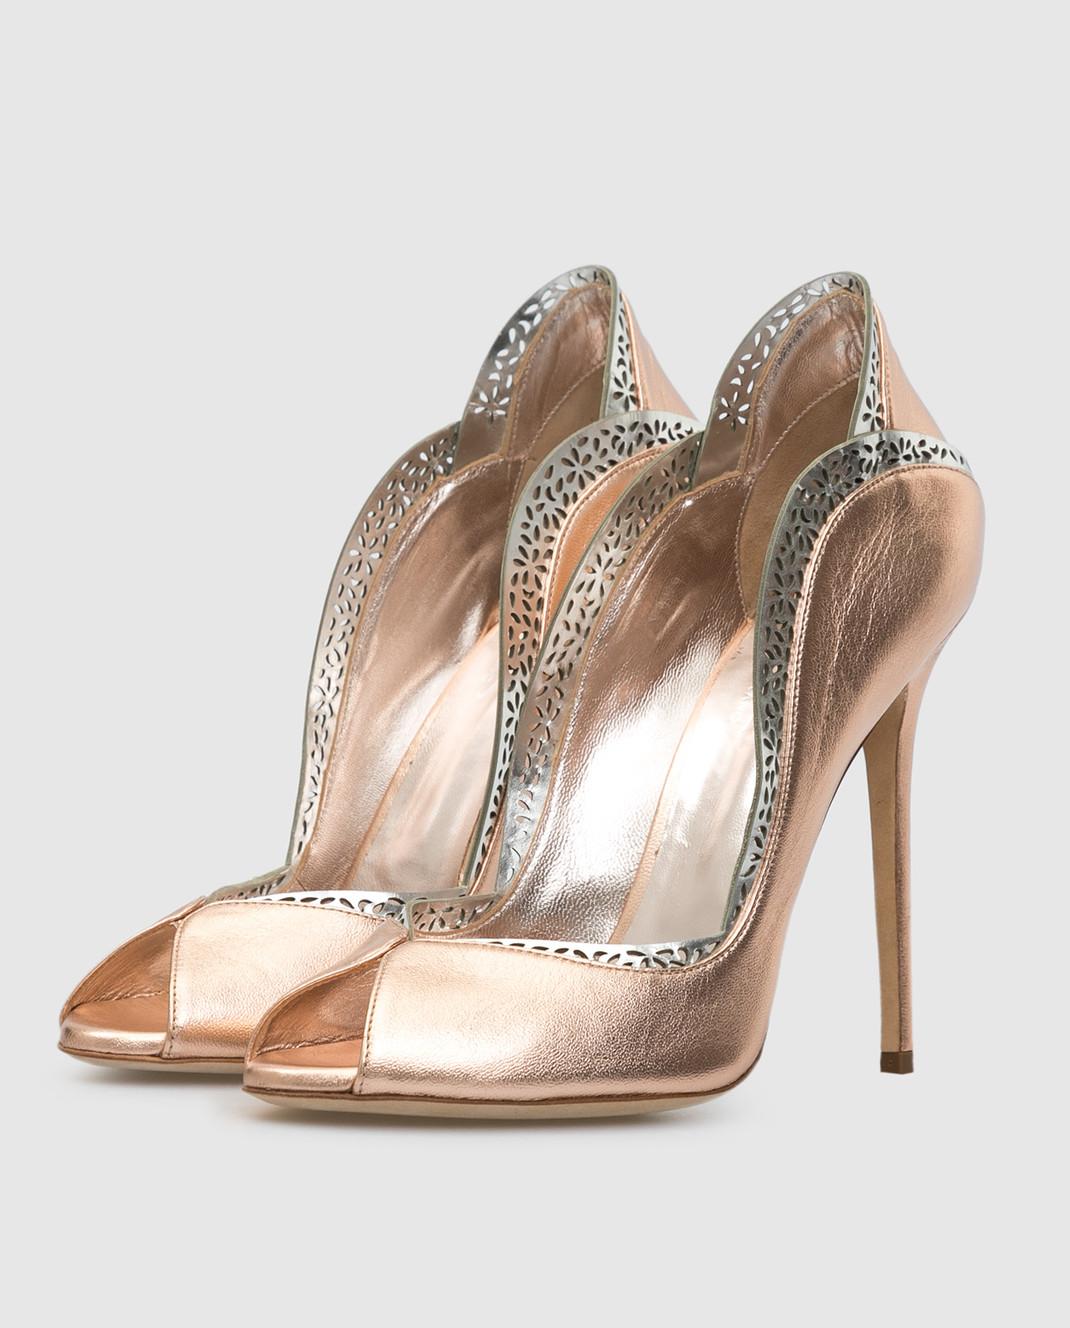 Cerasella Кожаные туфли DANAESPECCHIO изображение 3